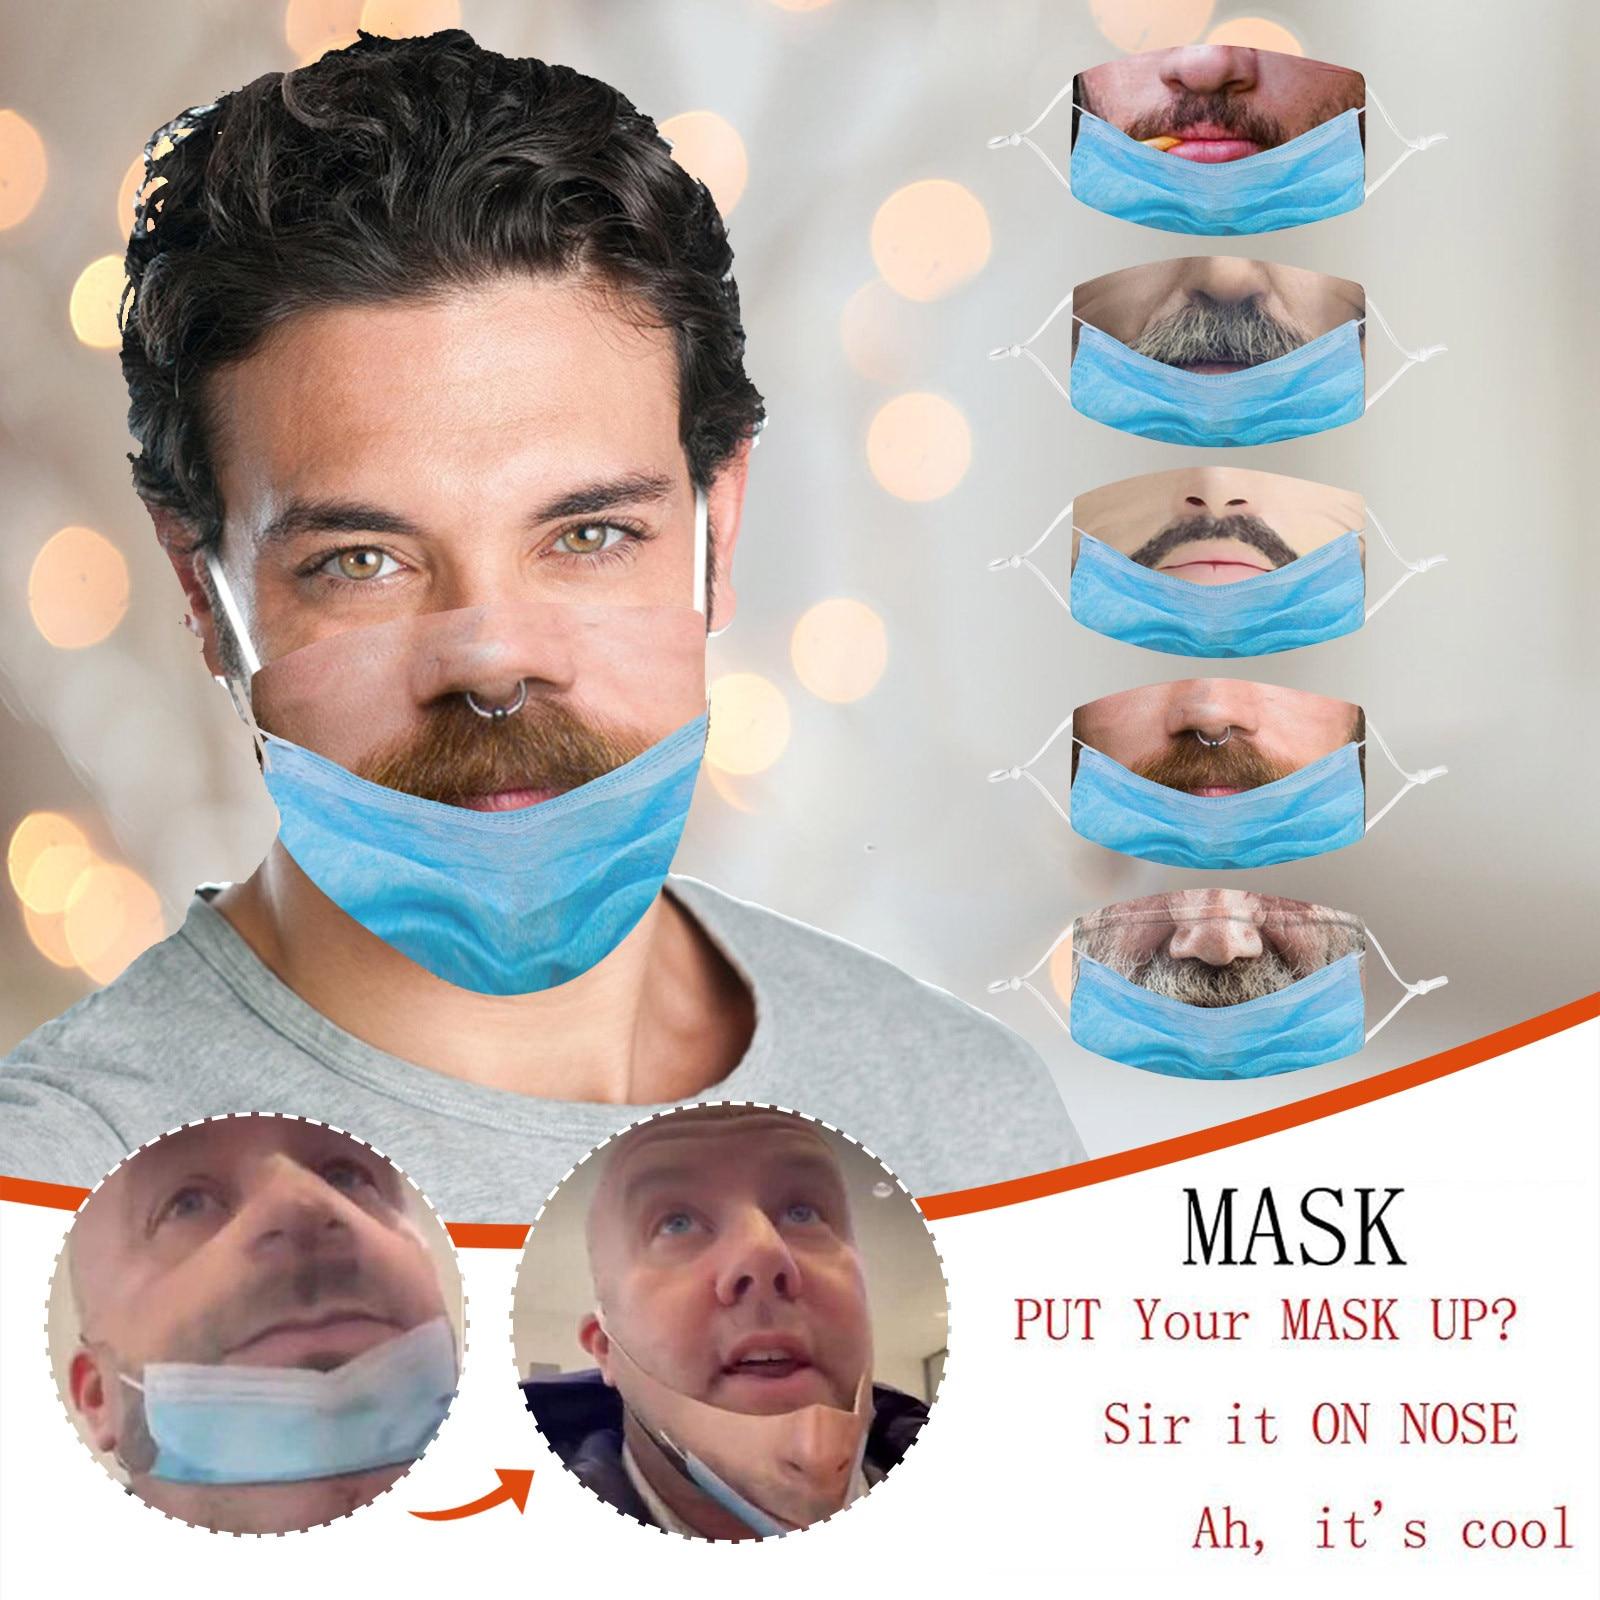 Mascarilla facial con estampado divertido, máscara facial creativa de imitación de no...